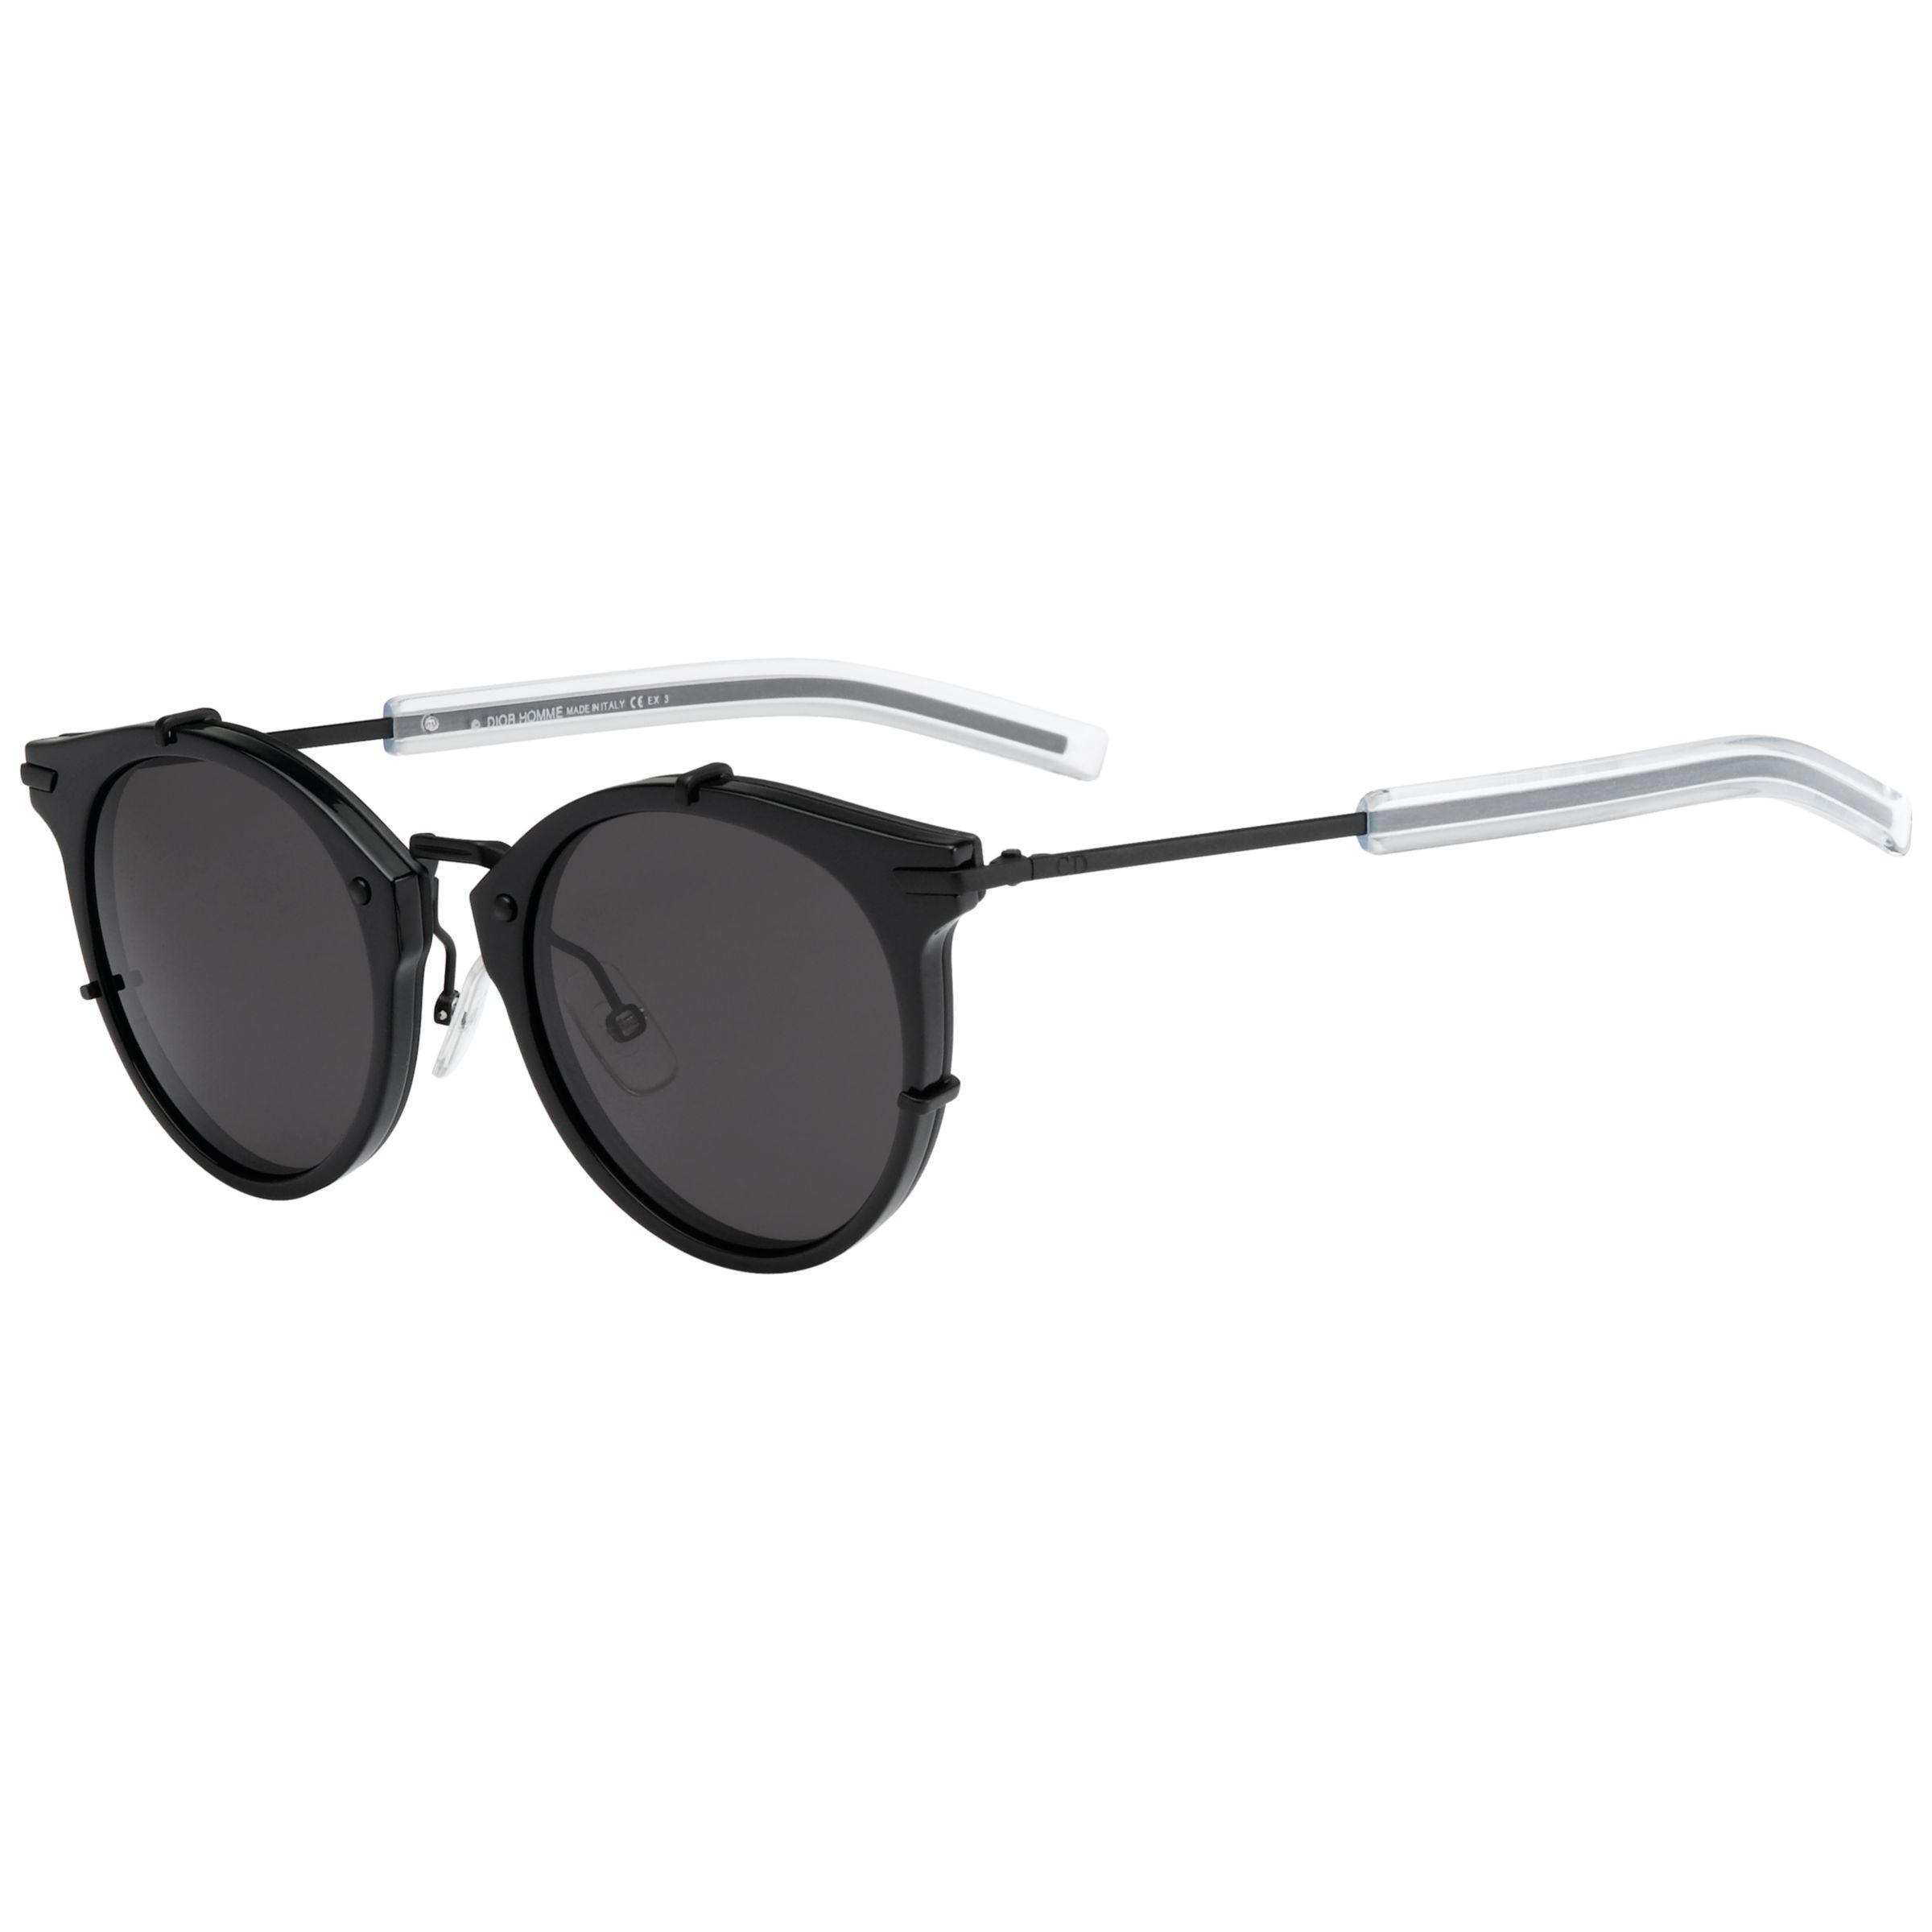 a96d70ff38c3 Dior 0196s Round Sunglasses in Black for Men - Lyst